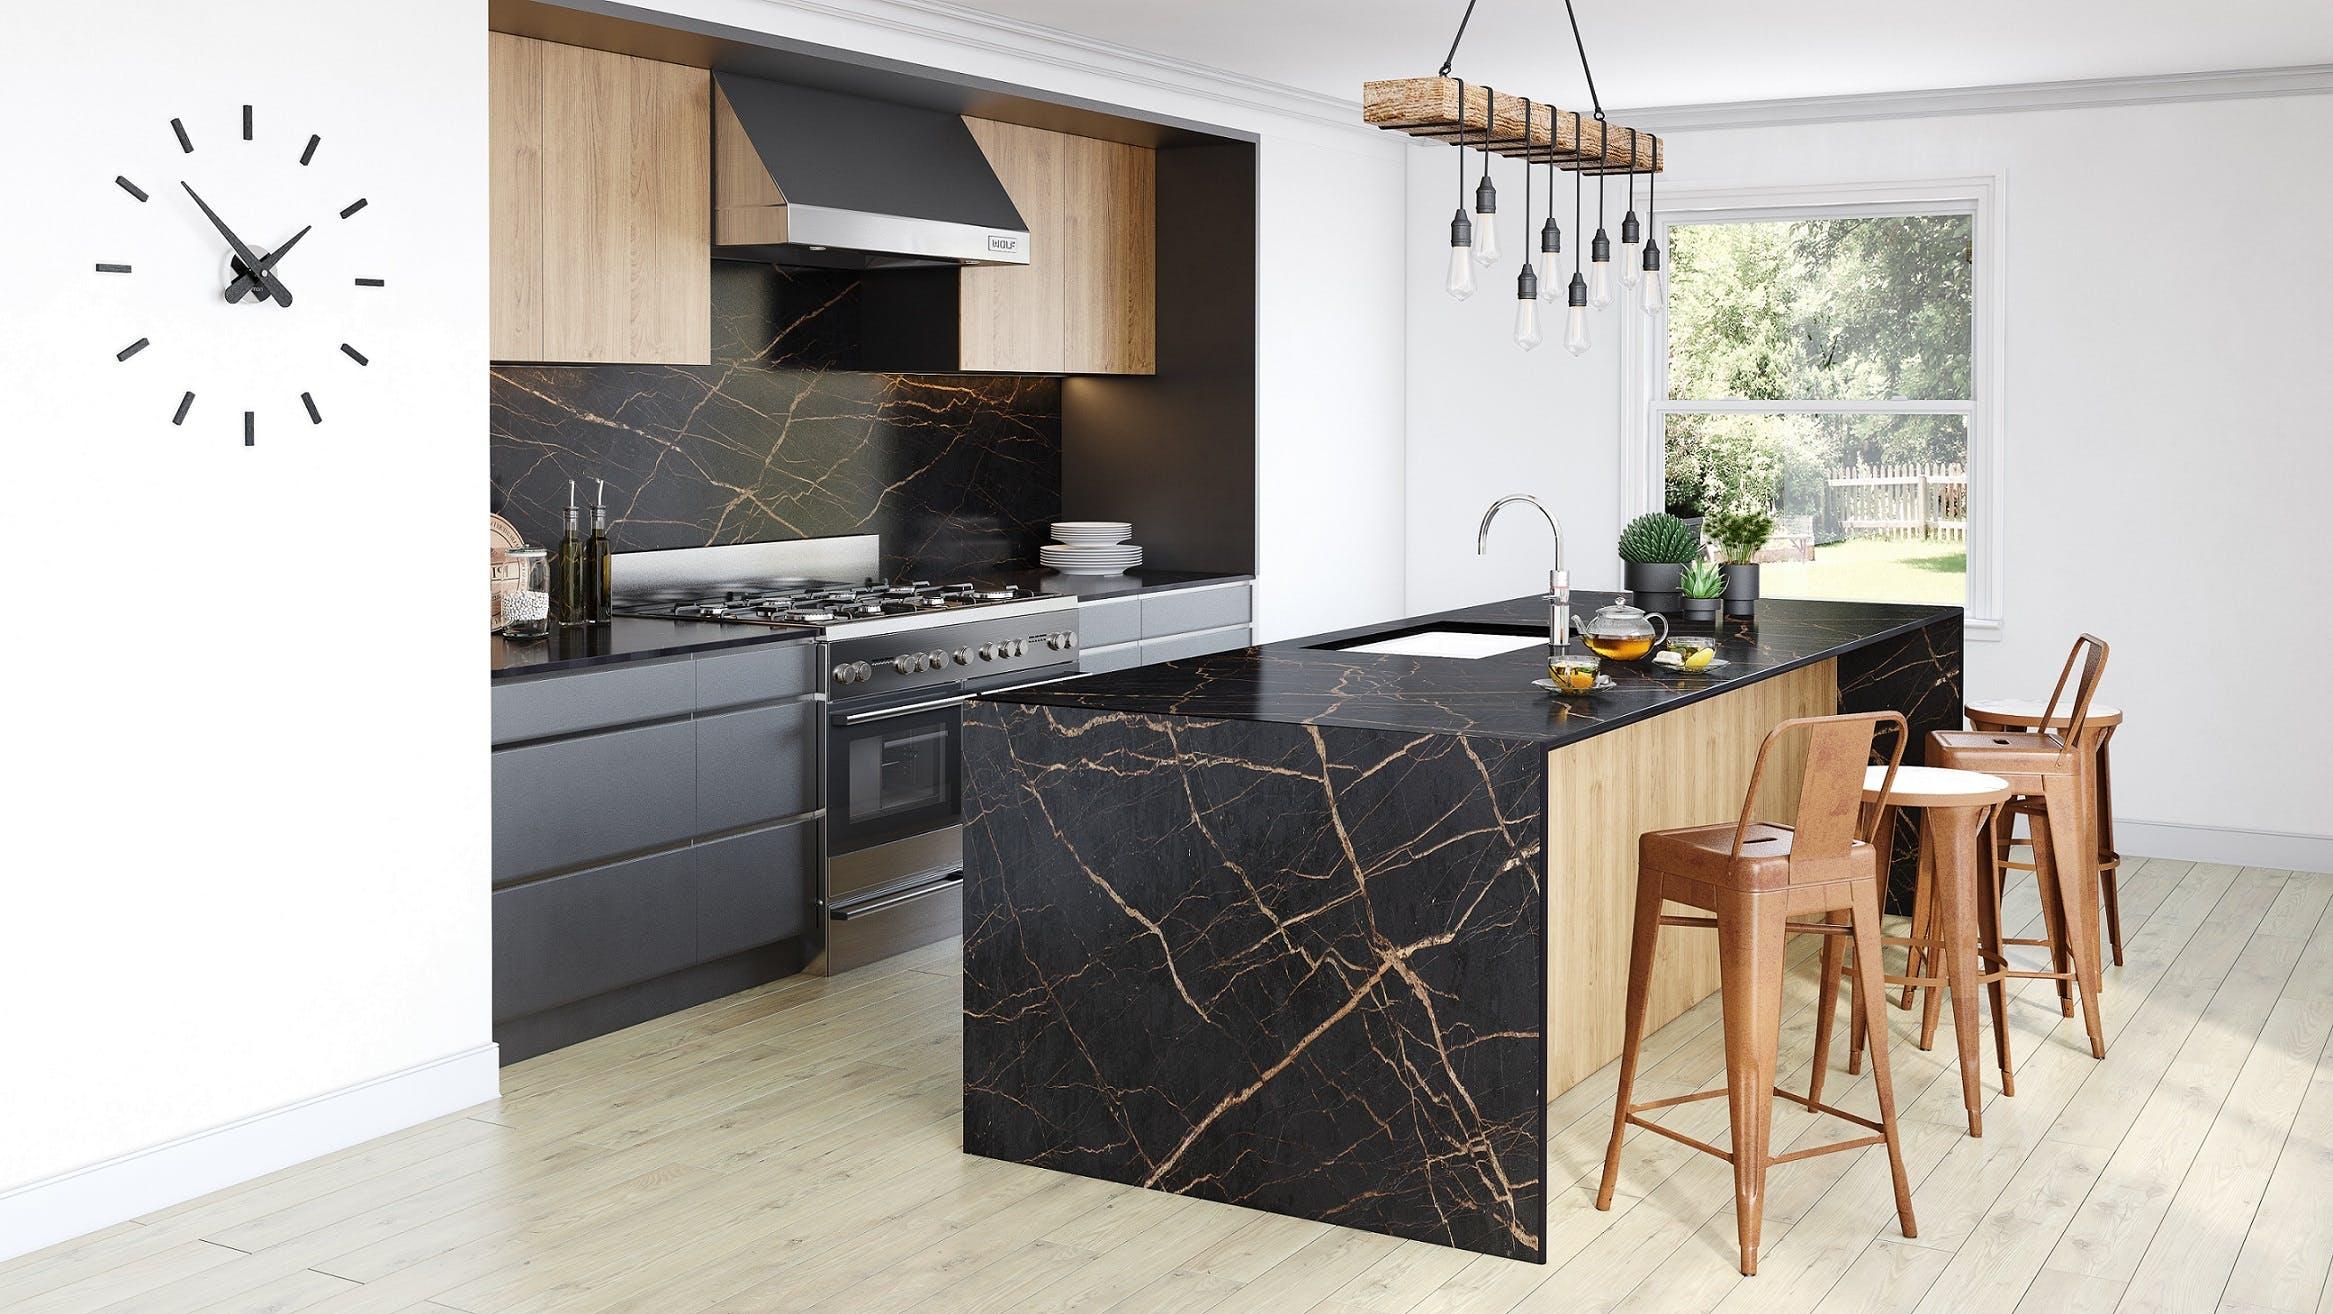 Image of Dekton Avant Garde Laurent Kitchen 1 in Dekton Avant-Garde Series Named Honored in 2020 NYCxDesign Awards - Cosentino